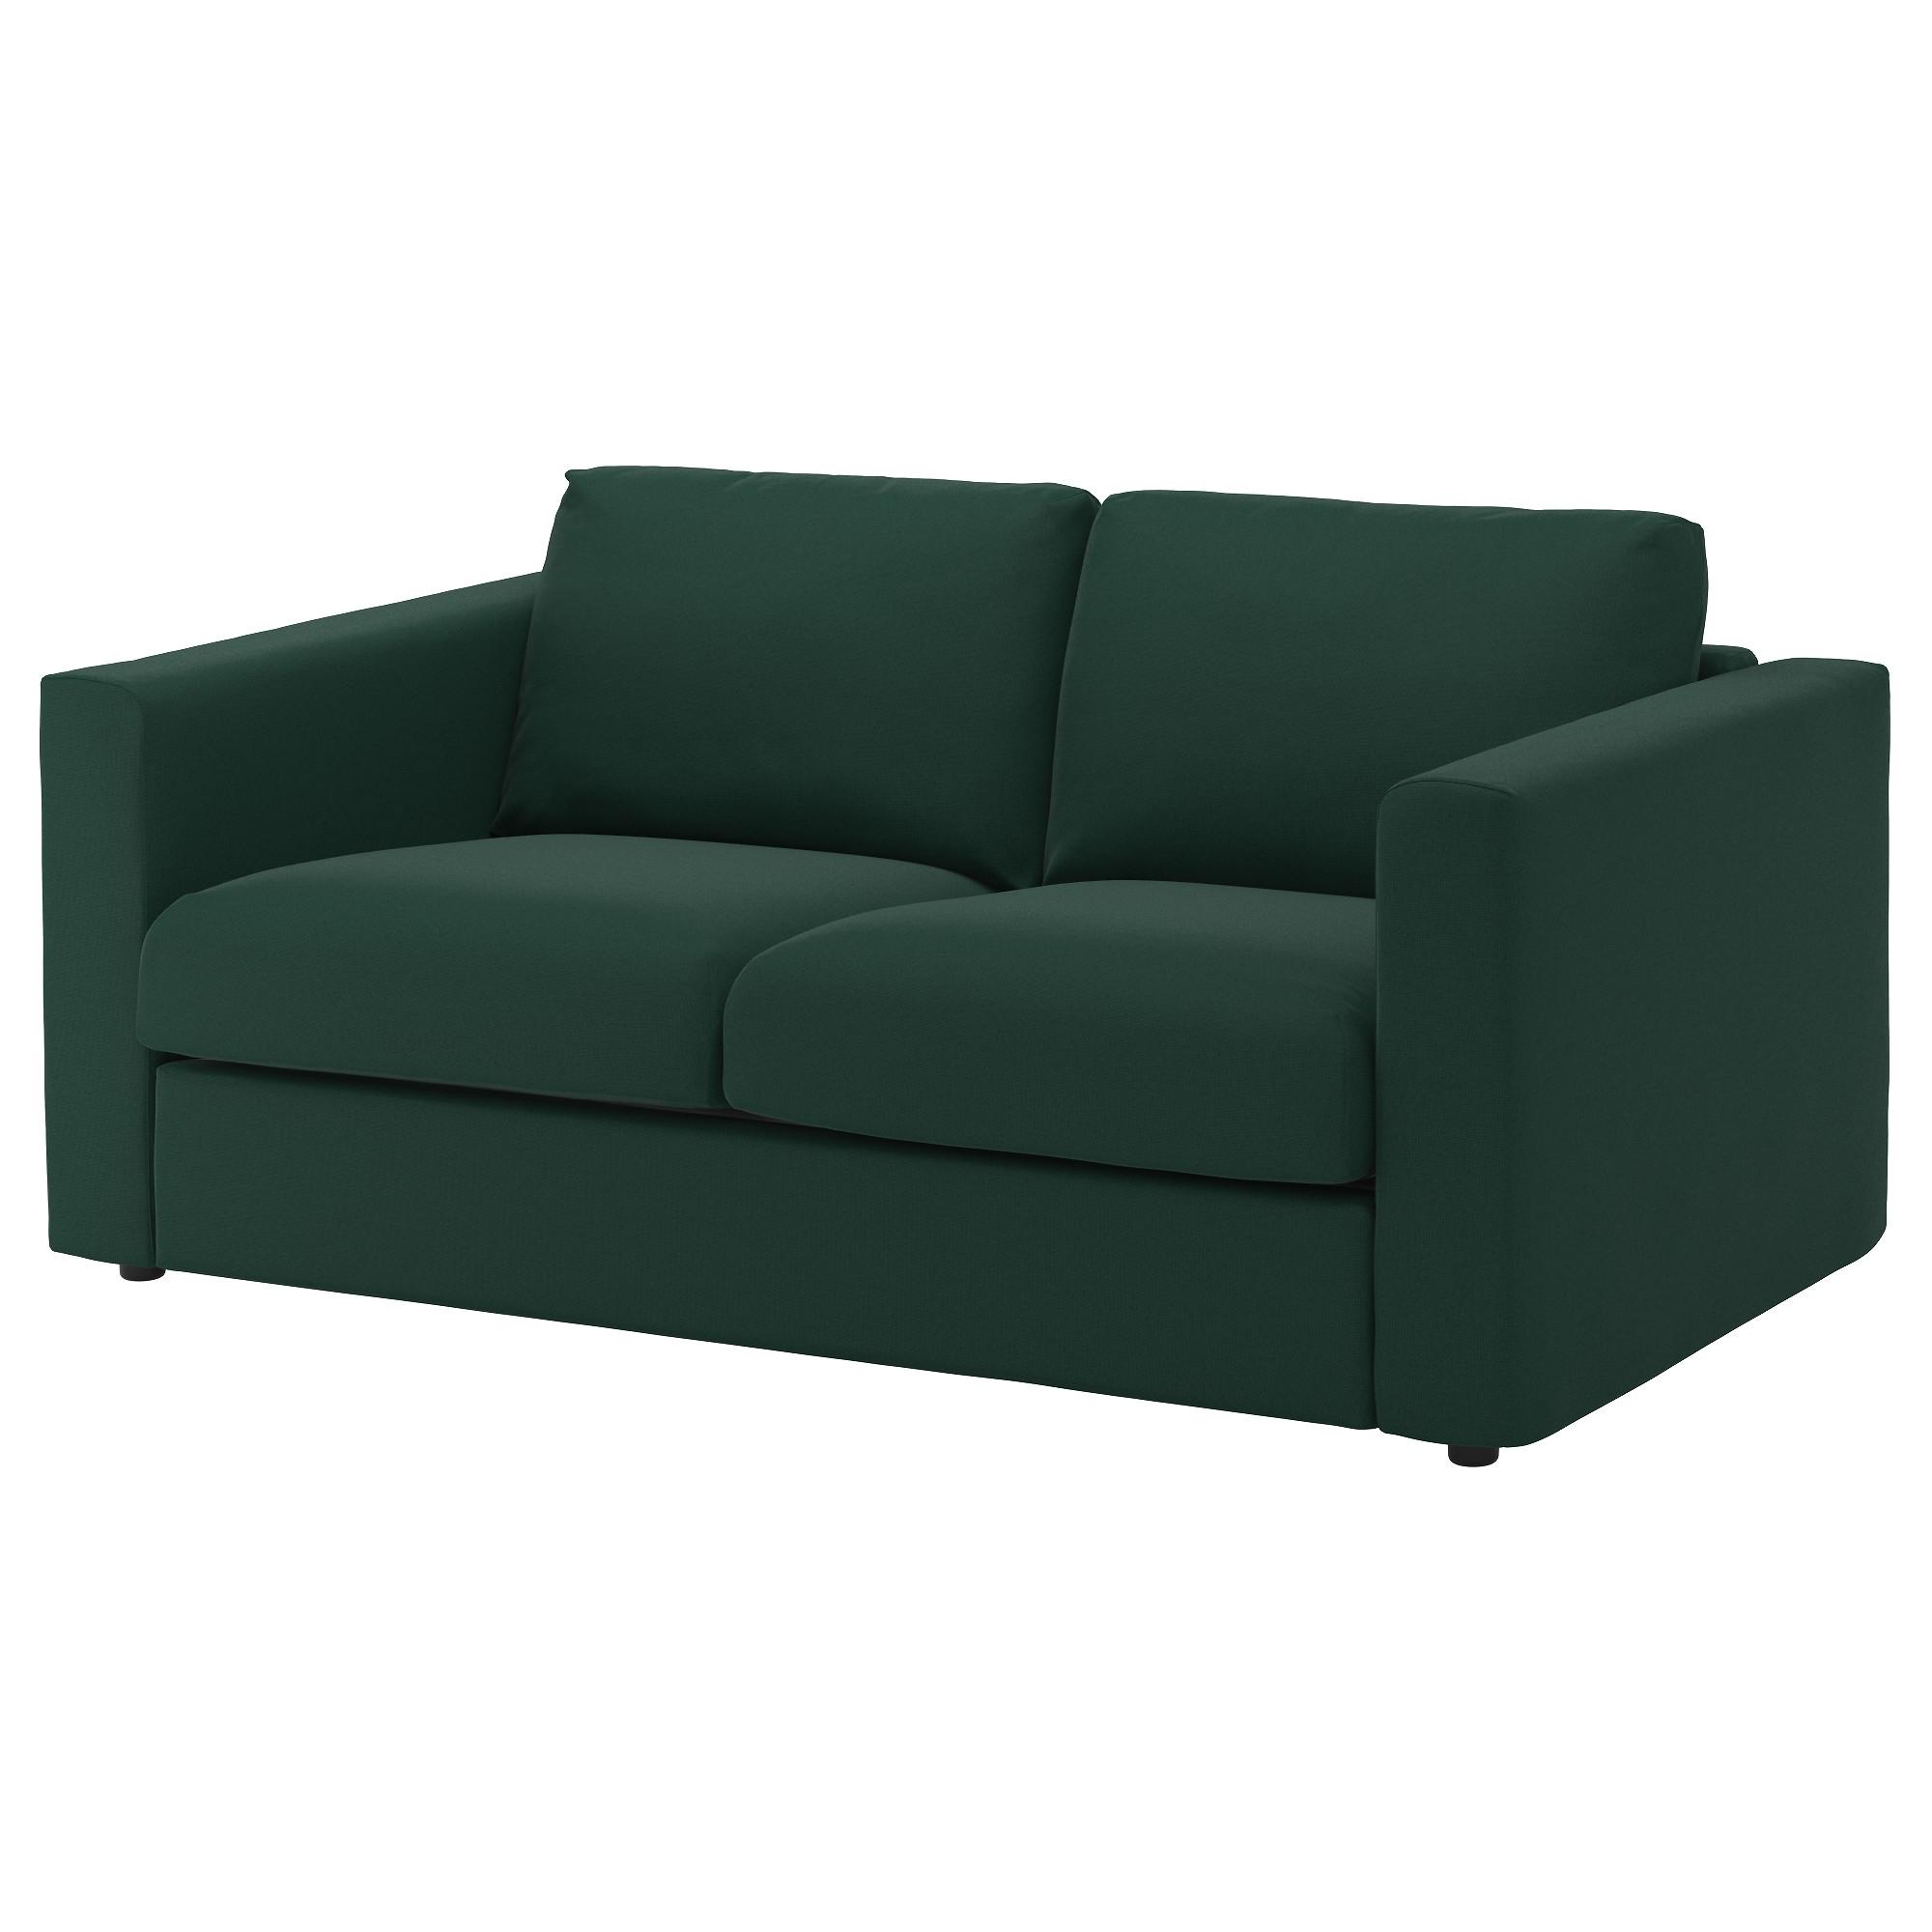 Vimle 2 Seat Sofa Gunnared Dark Green